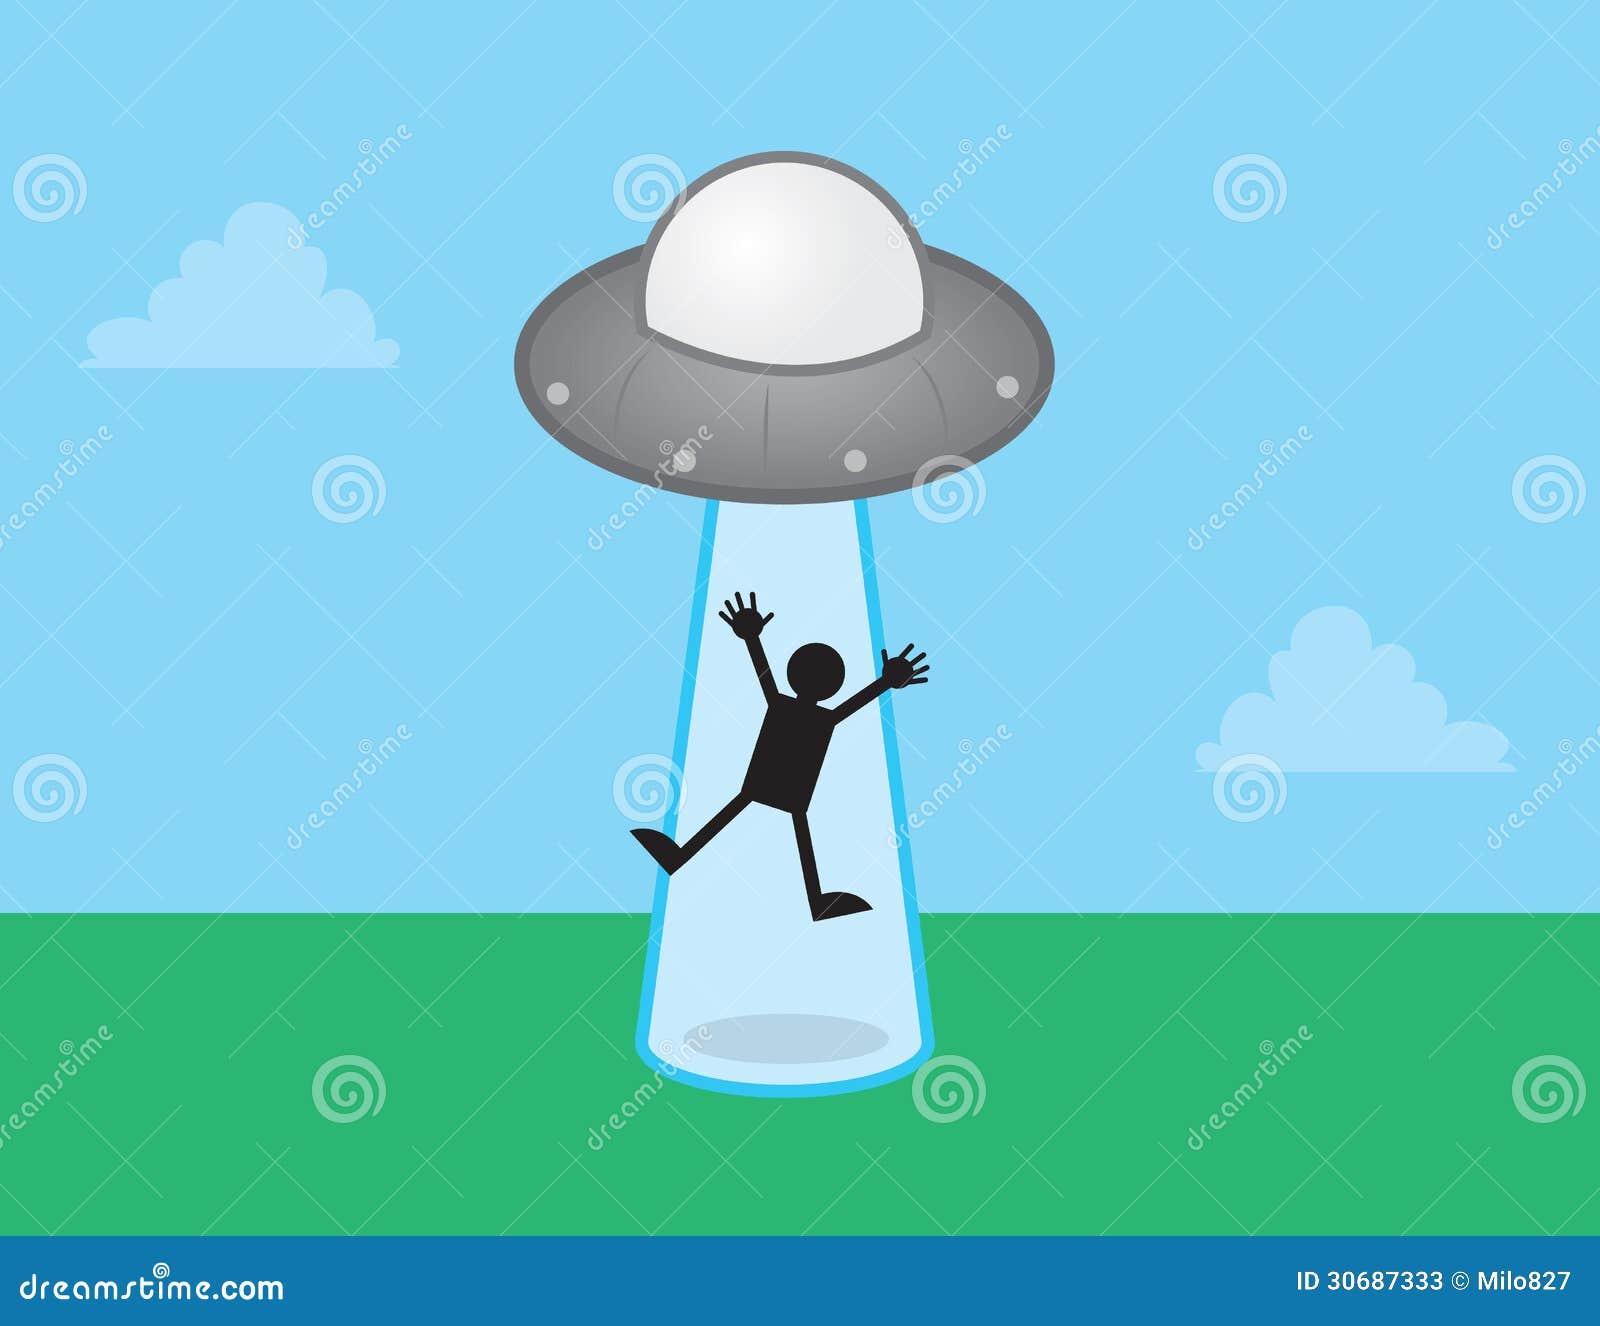 Alien Spaceship Beamed Figure  Ufo Beaming Up Person